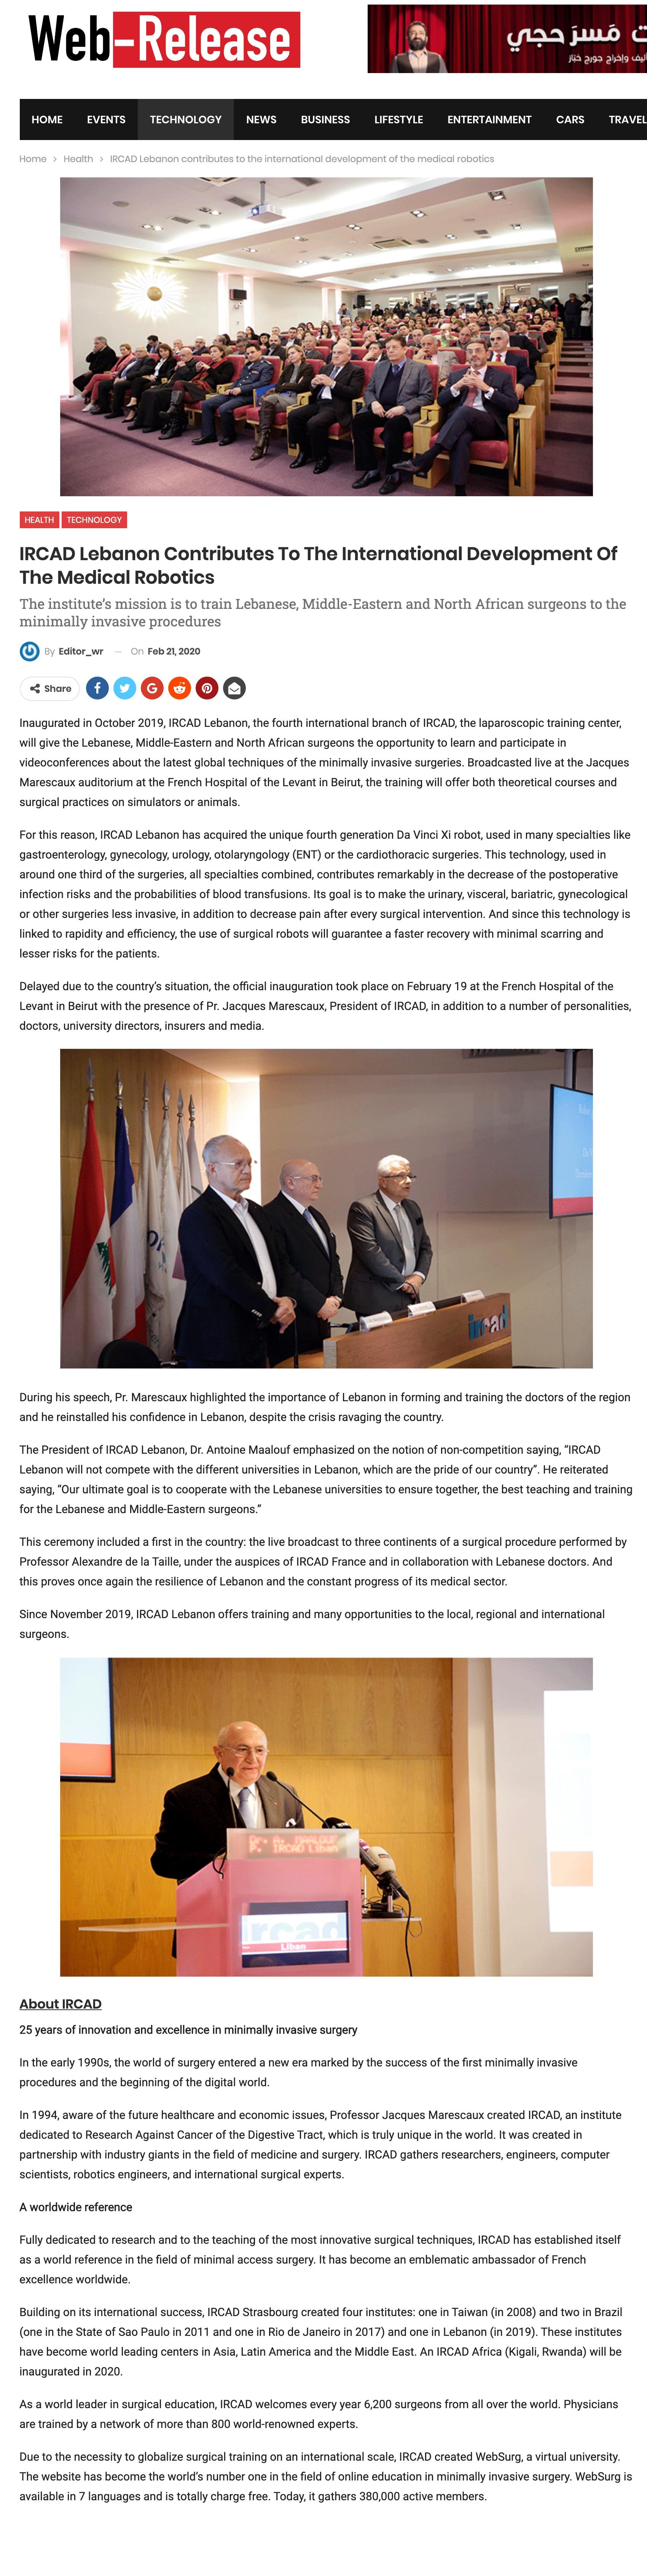 IRCAD Lebanon Contributes To The International Development Of The Medical Robotics